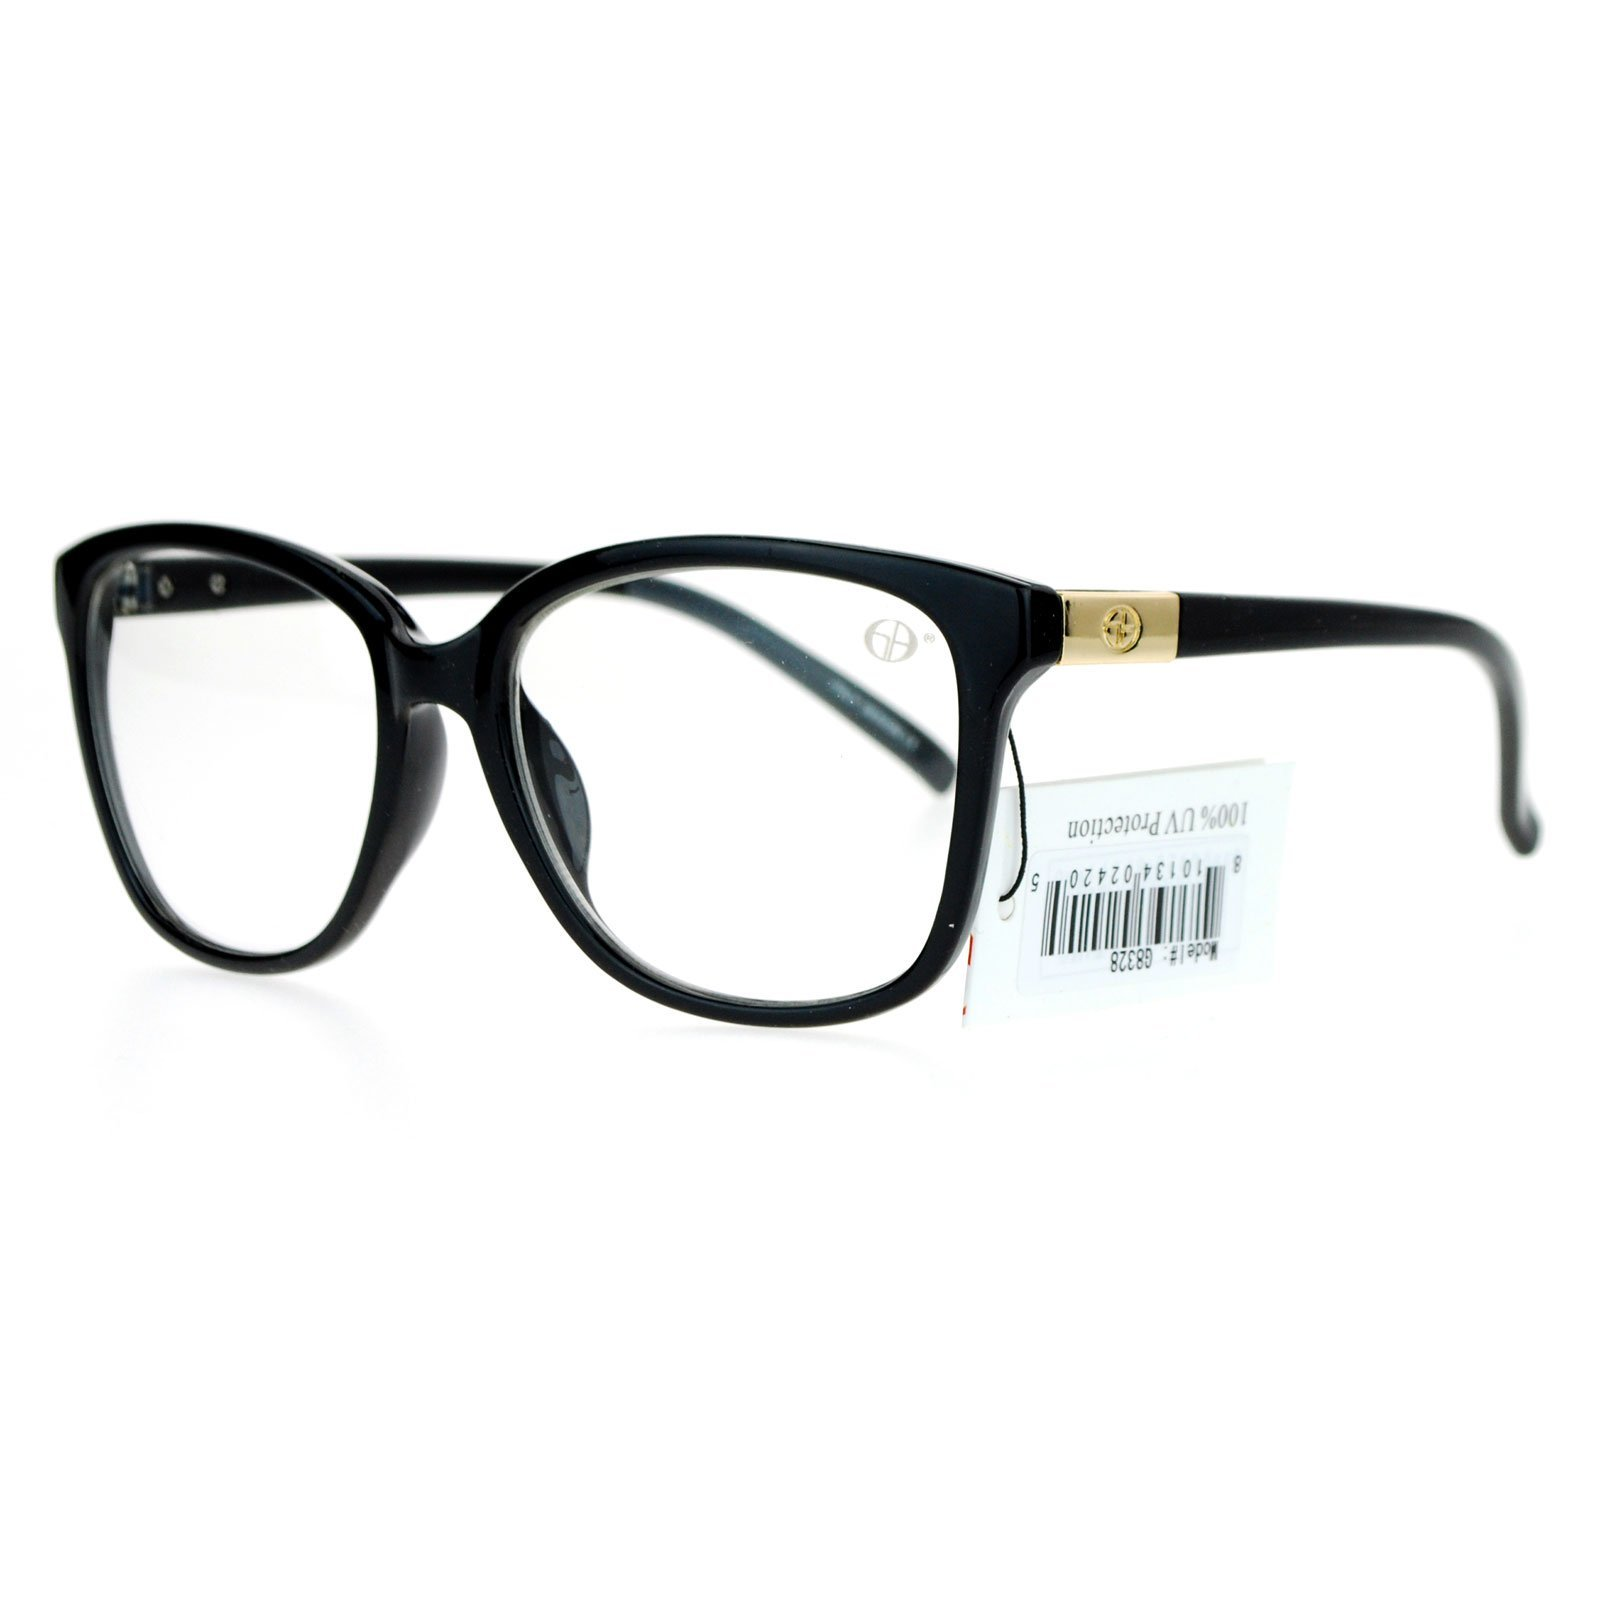 Golden Bridge Nerdy Designer Fashion Clear Lens Eye Glasses Black Gold